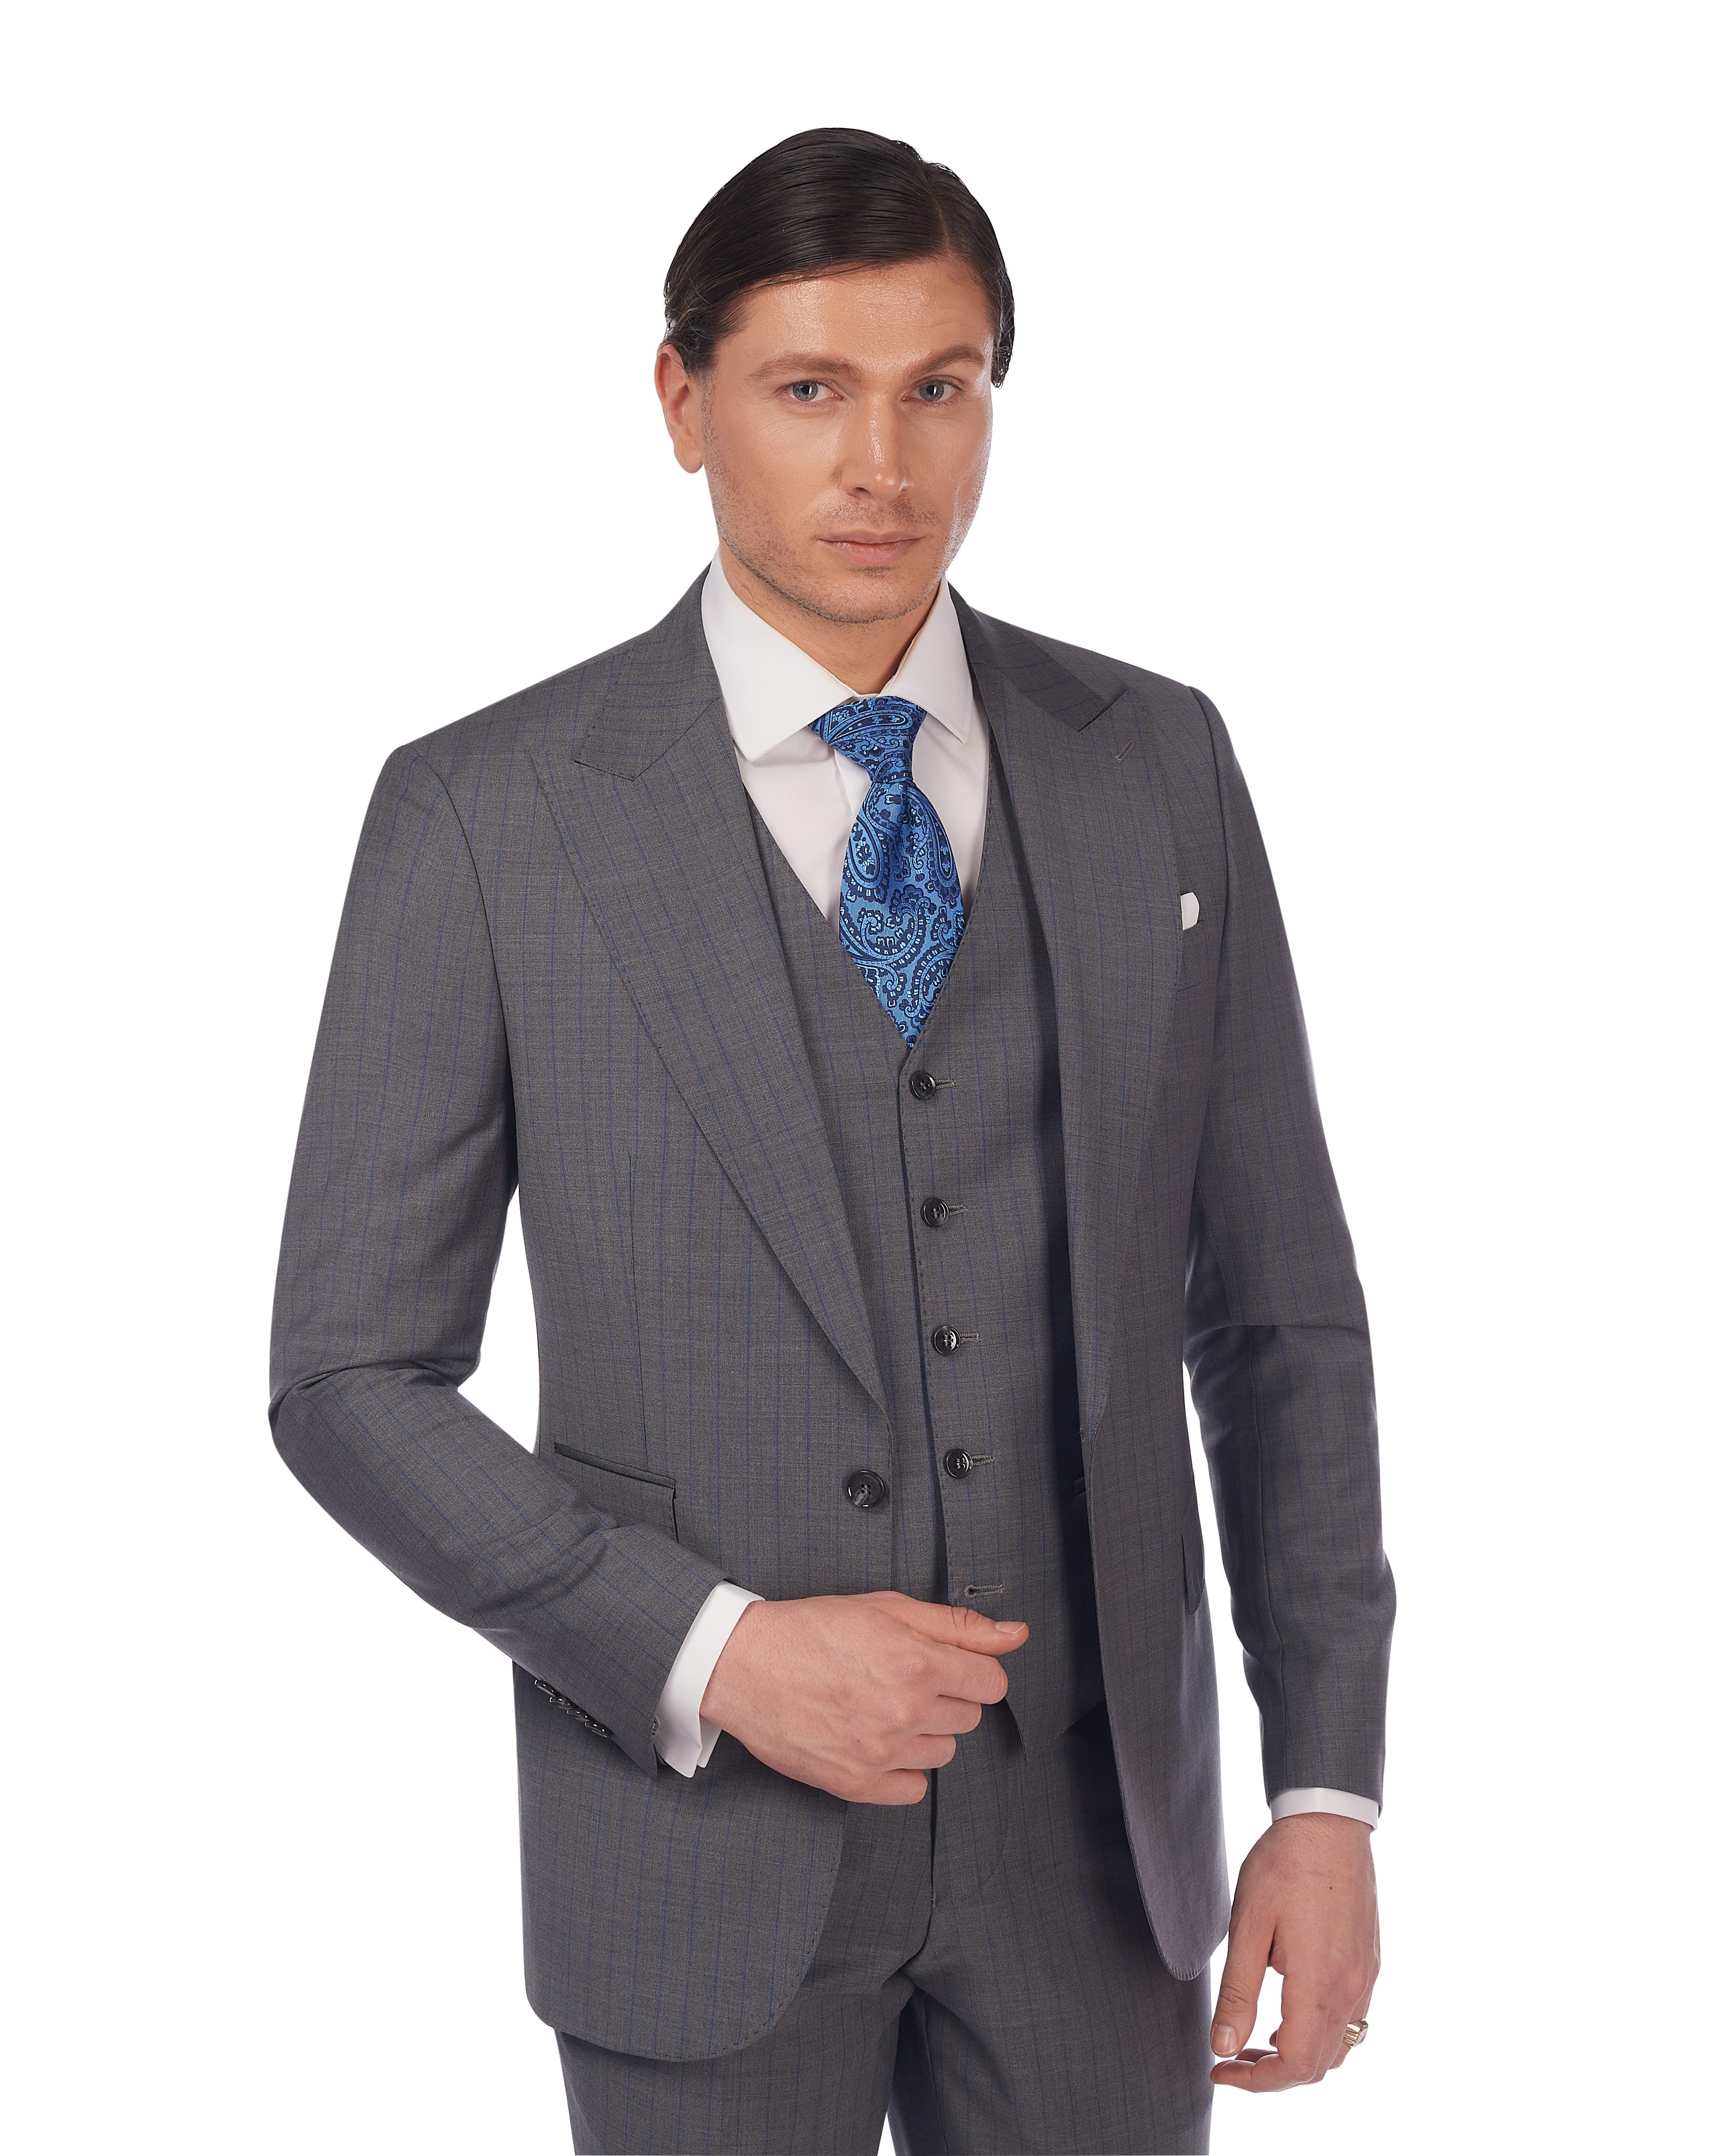 Costum-Elegant-Cu-Vesta-Gri-Magazin-Costume-Barbati-Cluj-Napoca-Gentlemens-Boutique-Gold-Soporului-8-